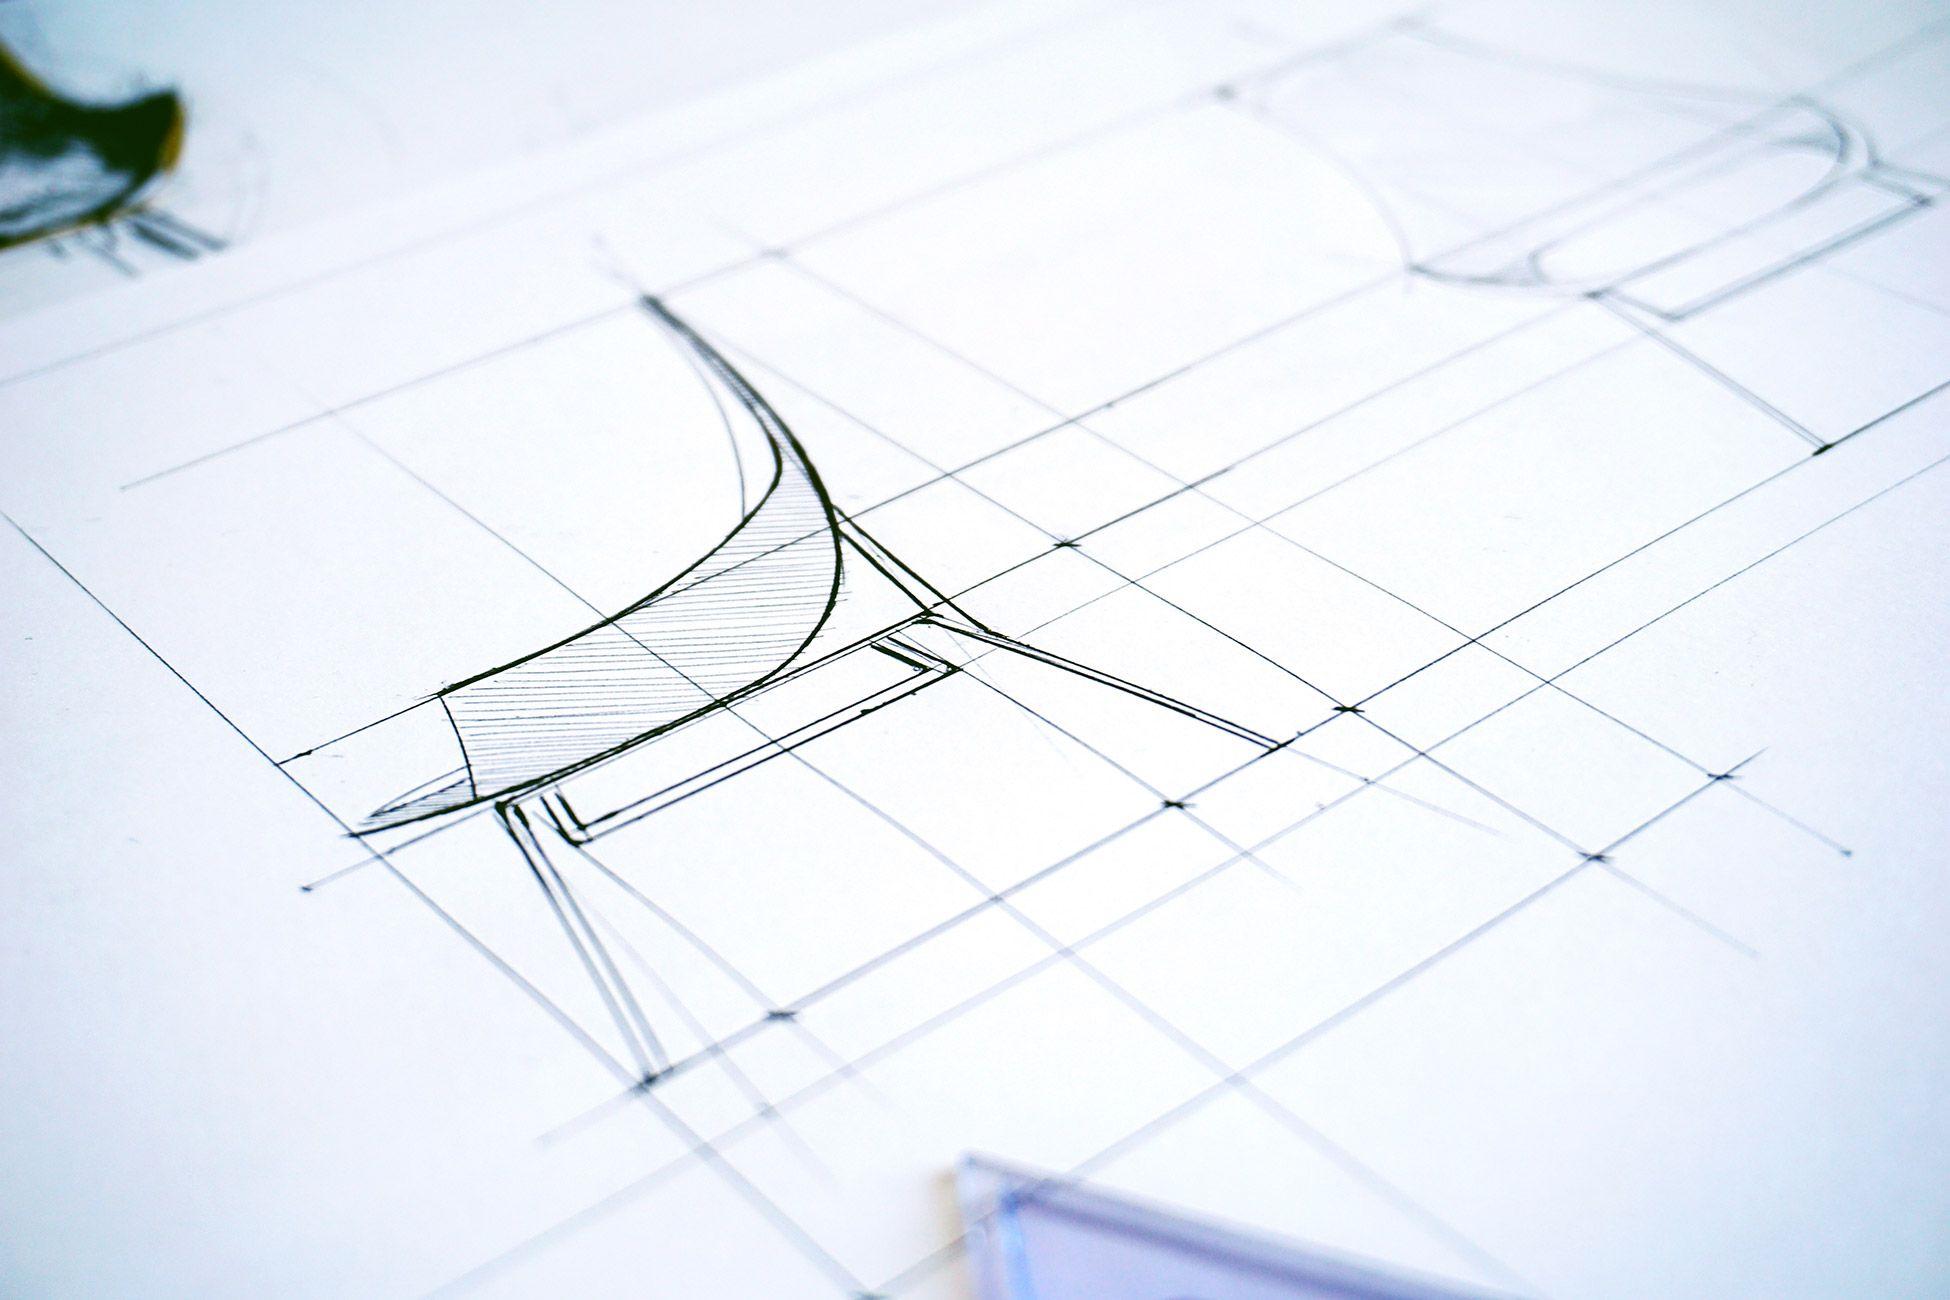 creation sur mesure mobilier architecte interieur grenoble pocino. Black Bedroom Furniture Sets. Home Design Ideas